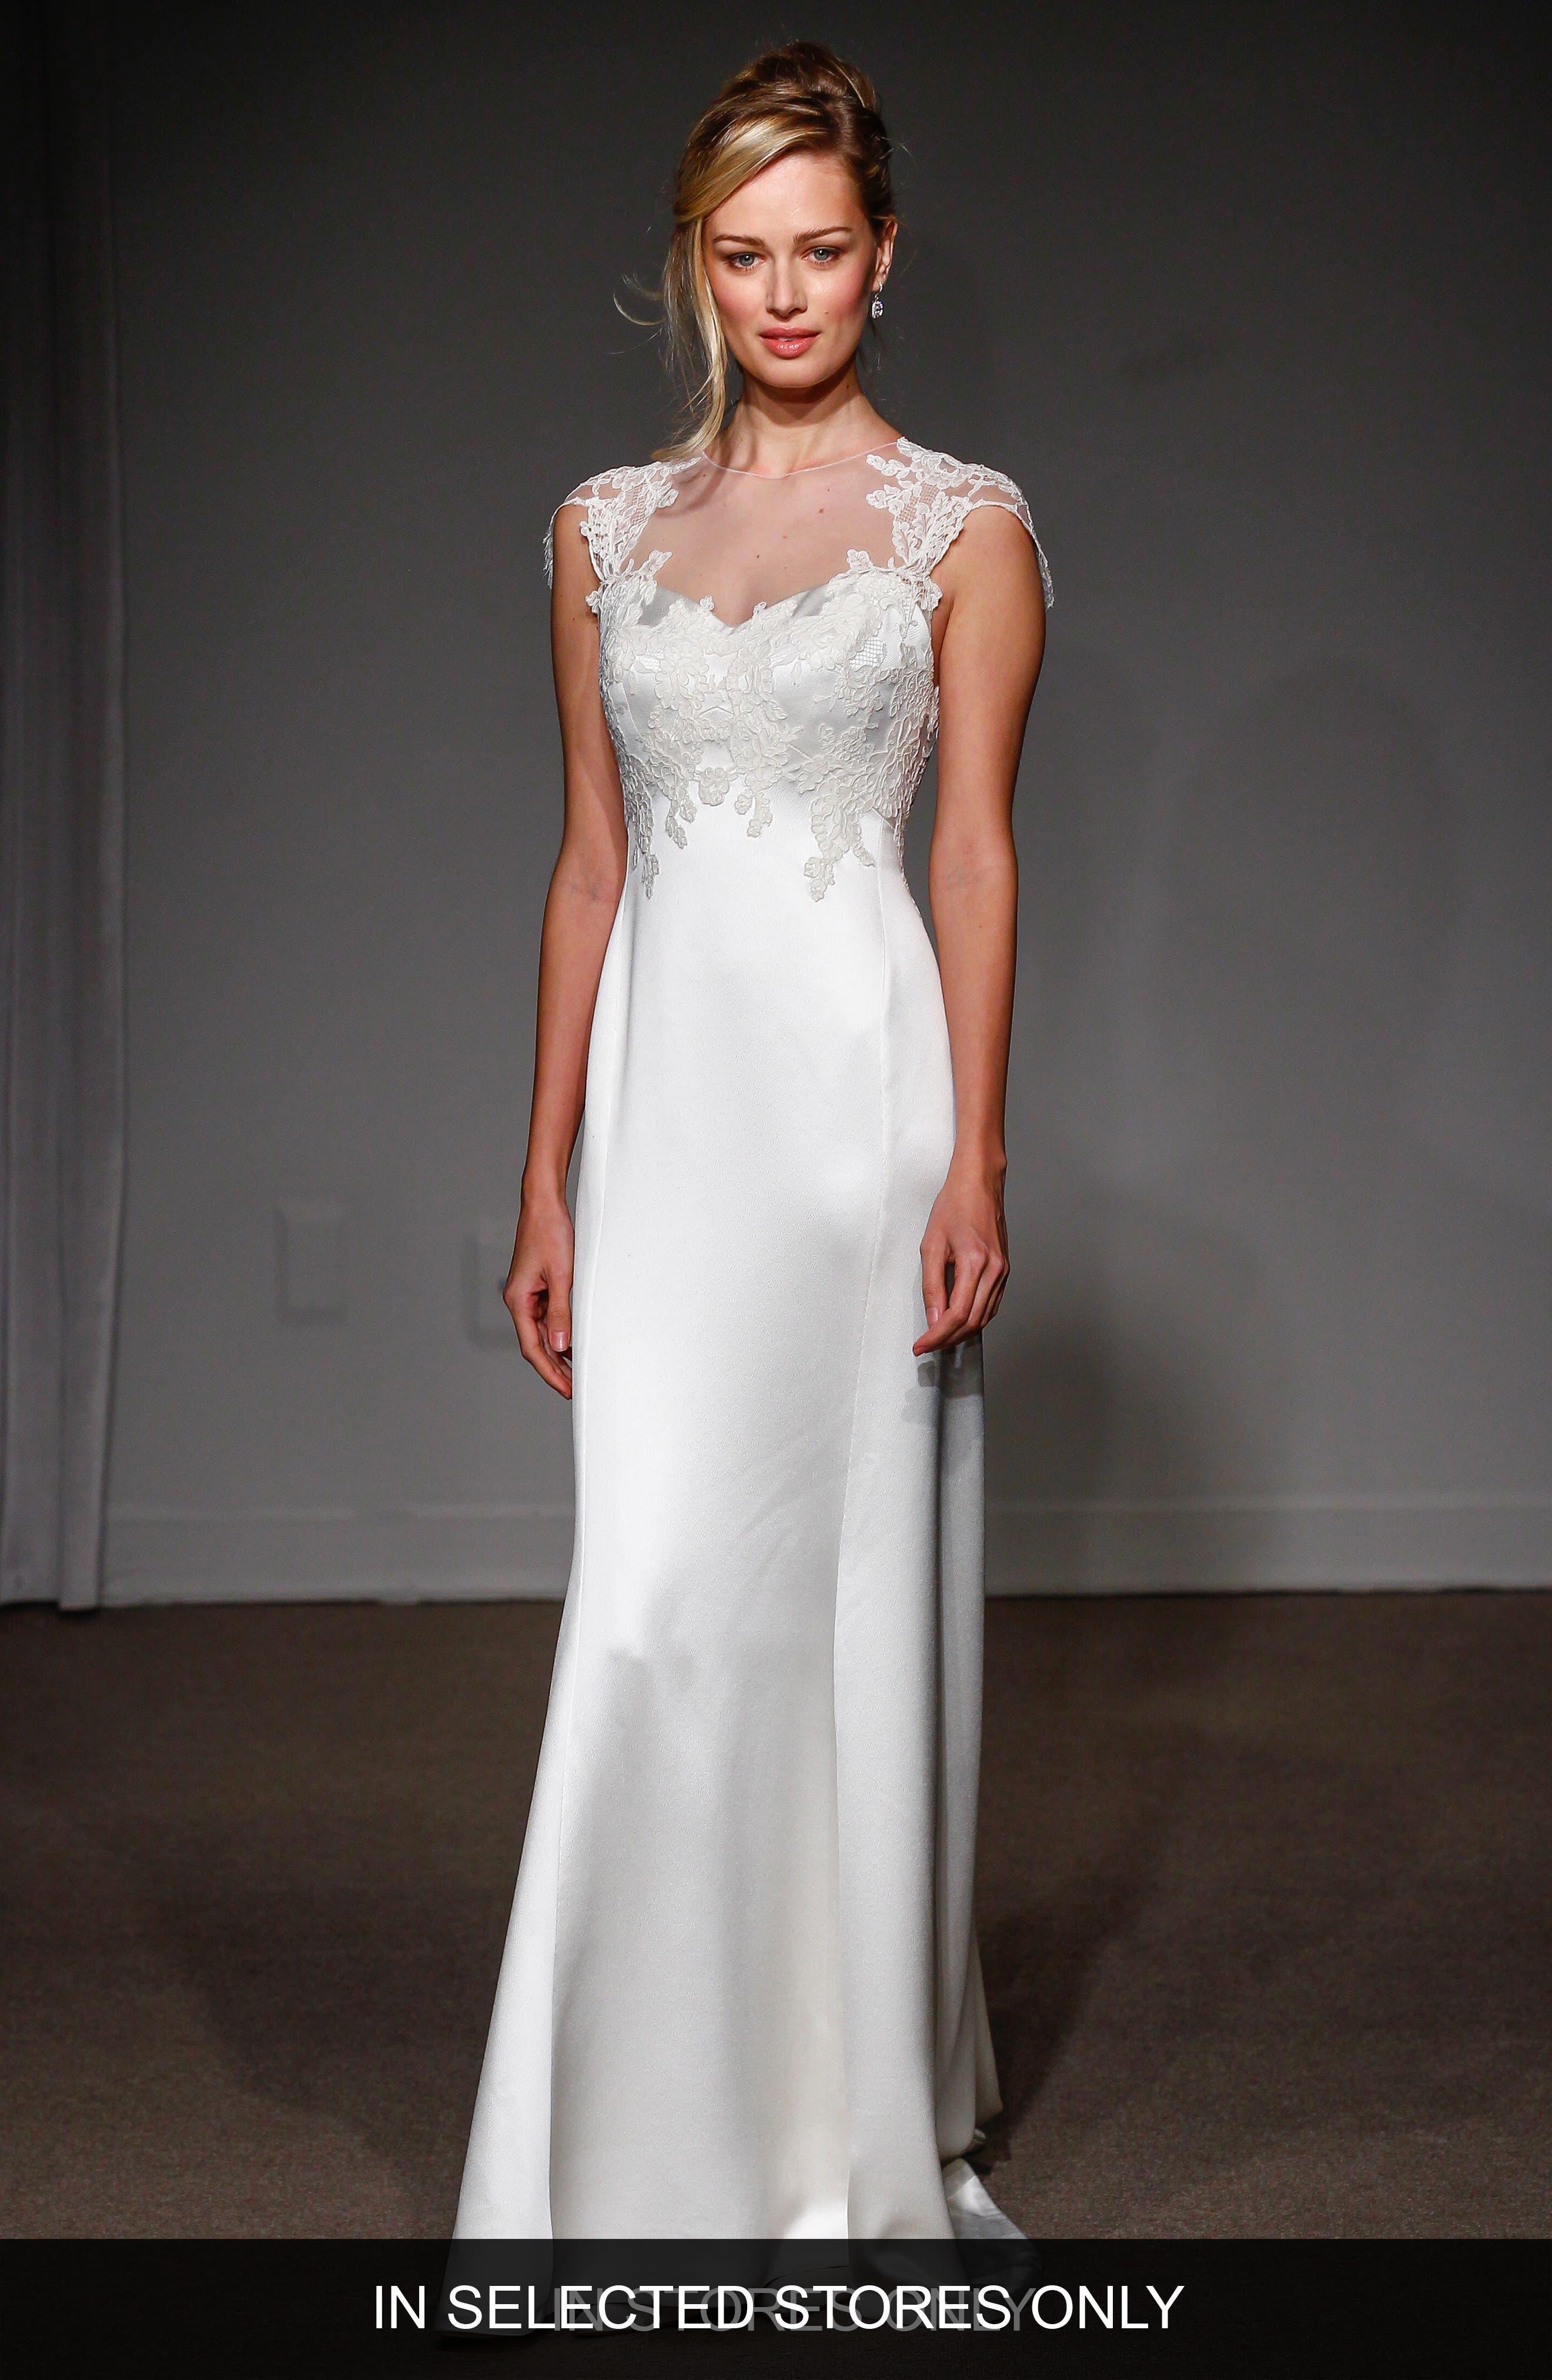 Main Image - Anna Maier Couture Grace Illusion Neck Lace & Satin A-Line Gown